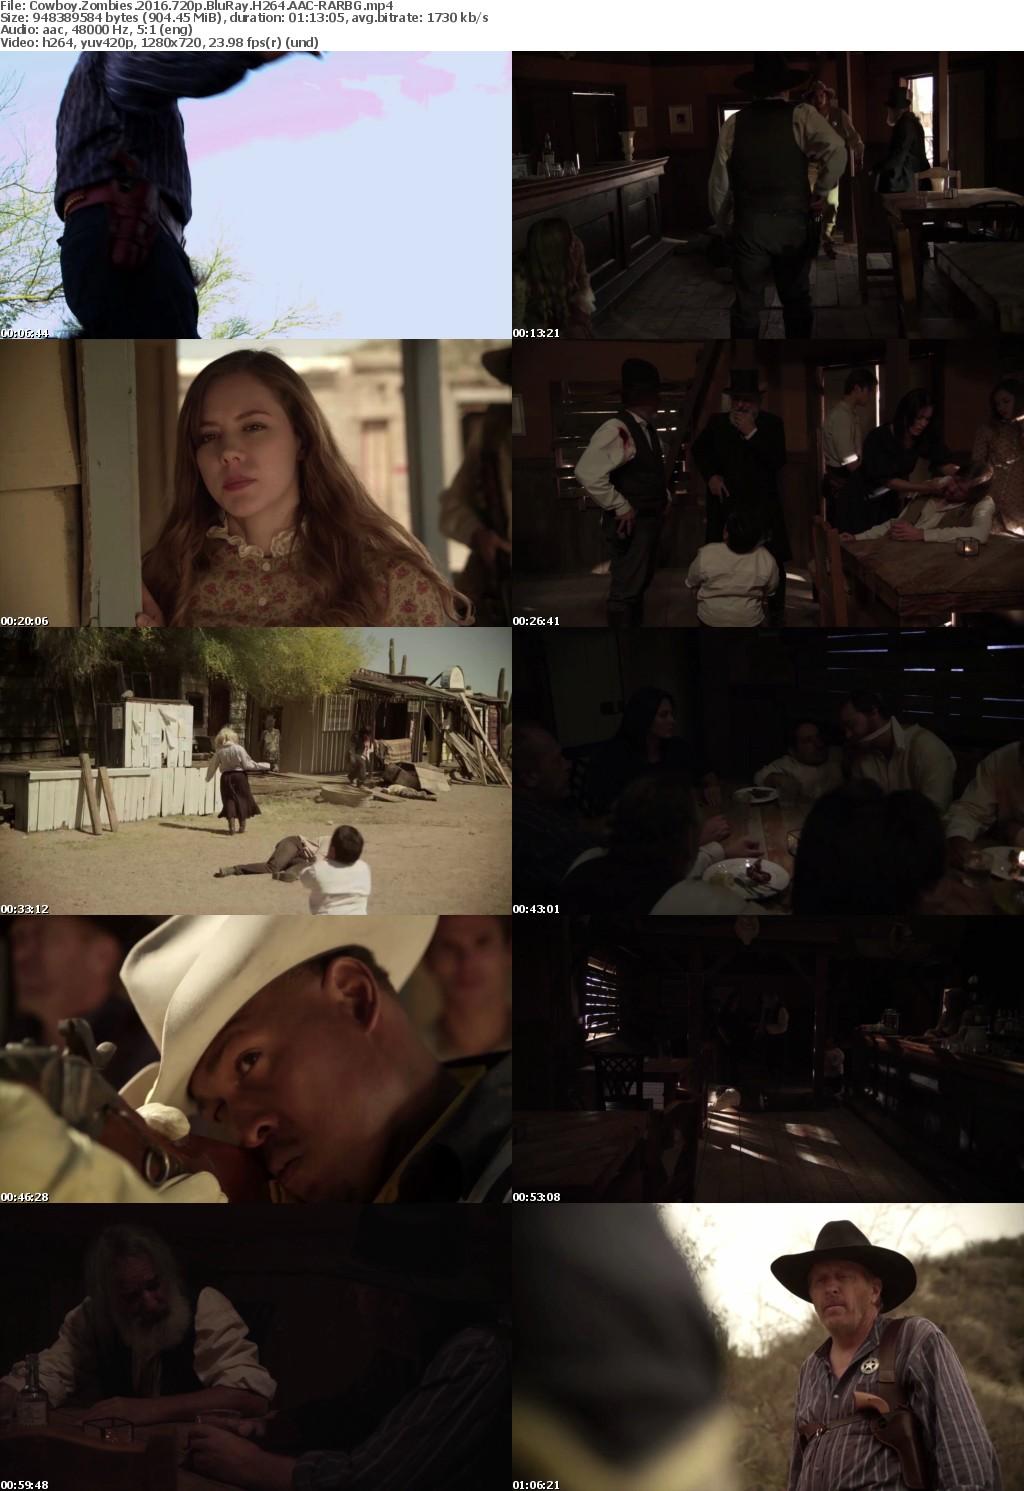 Cowboy Zombies (2016) 720p BluRay H264 AAC-RARBG